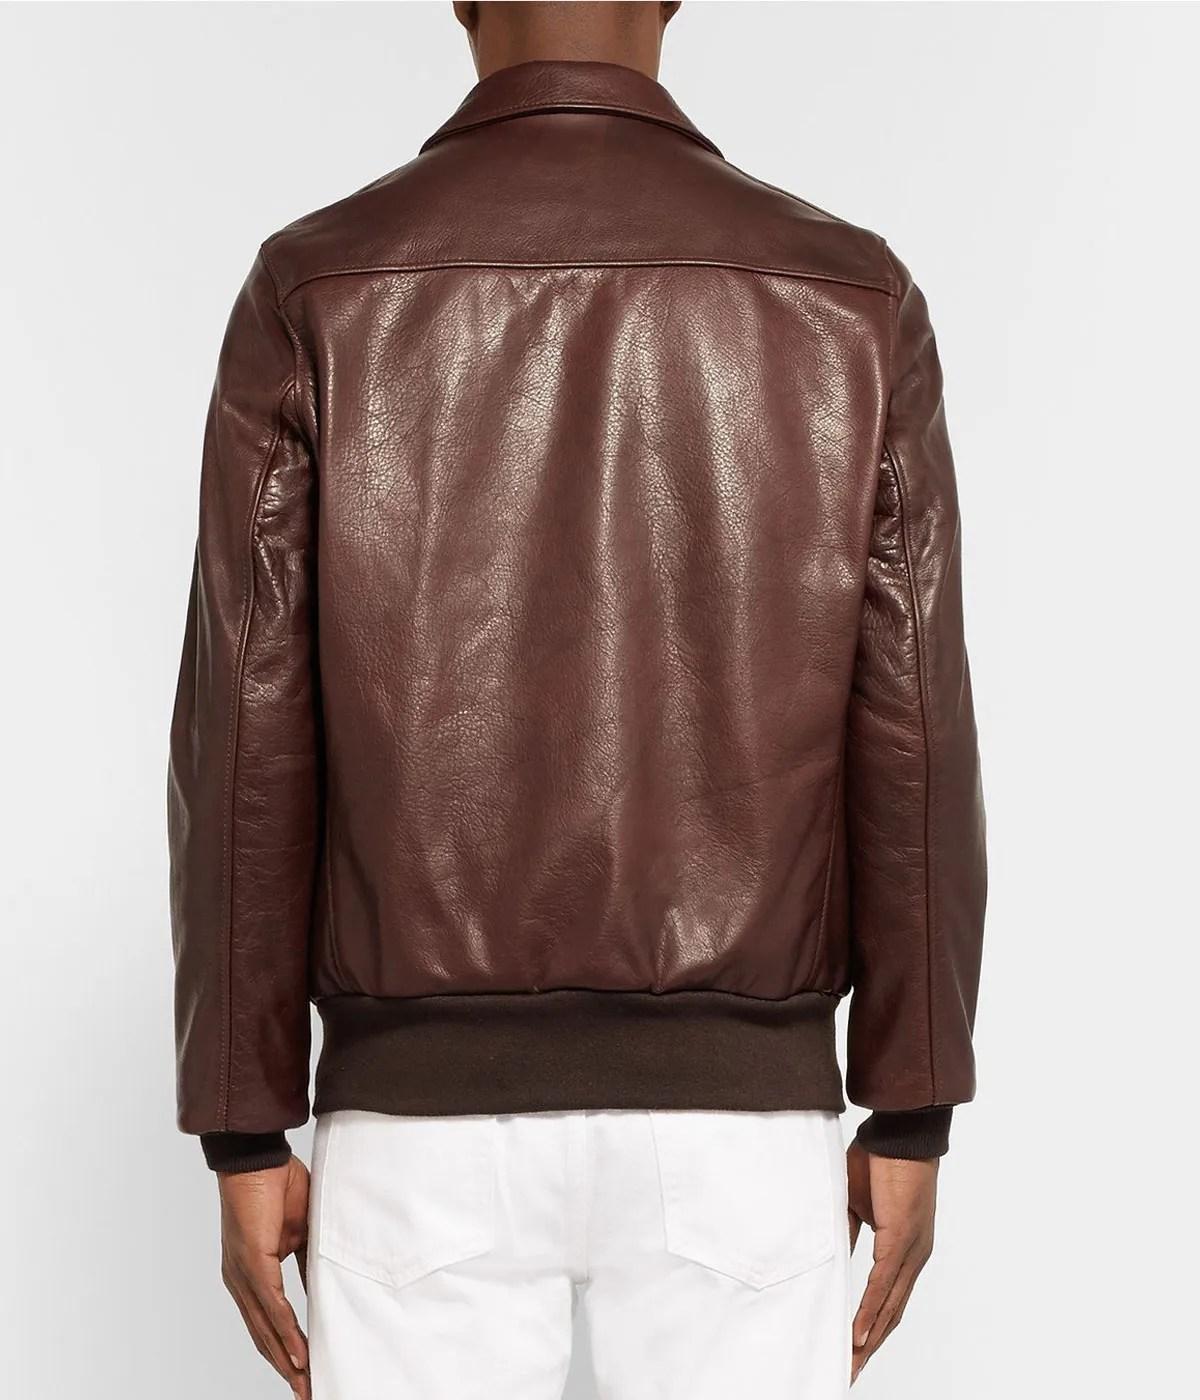 grain-adam-spencer-leather-jacket